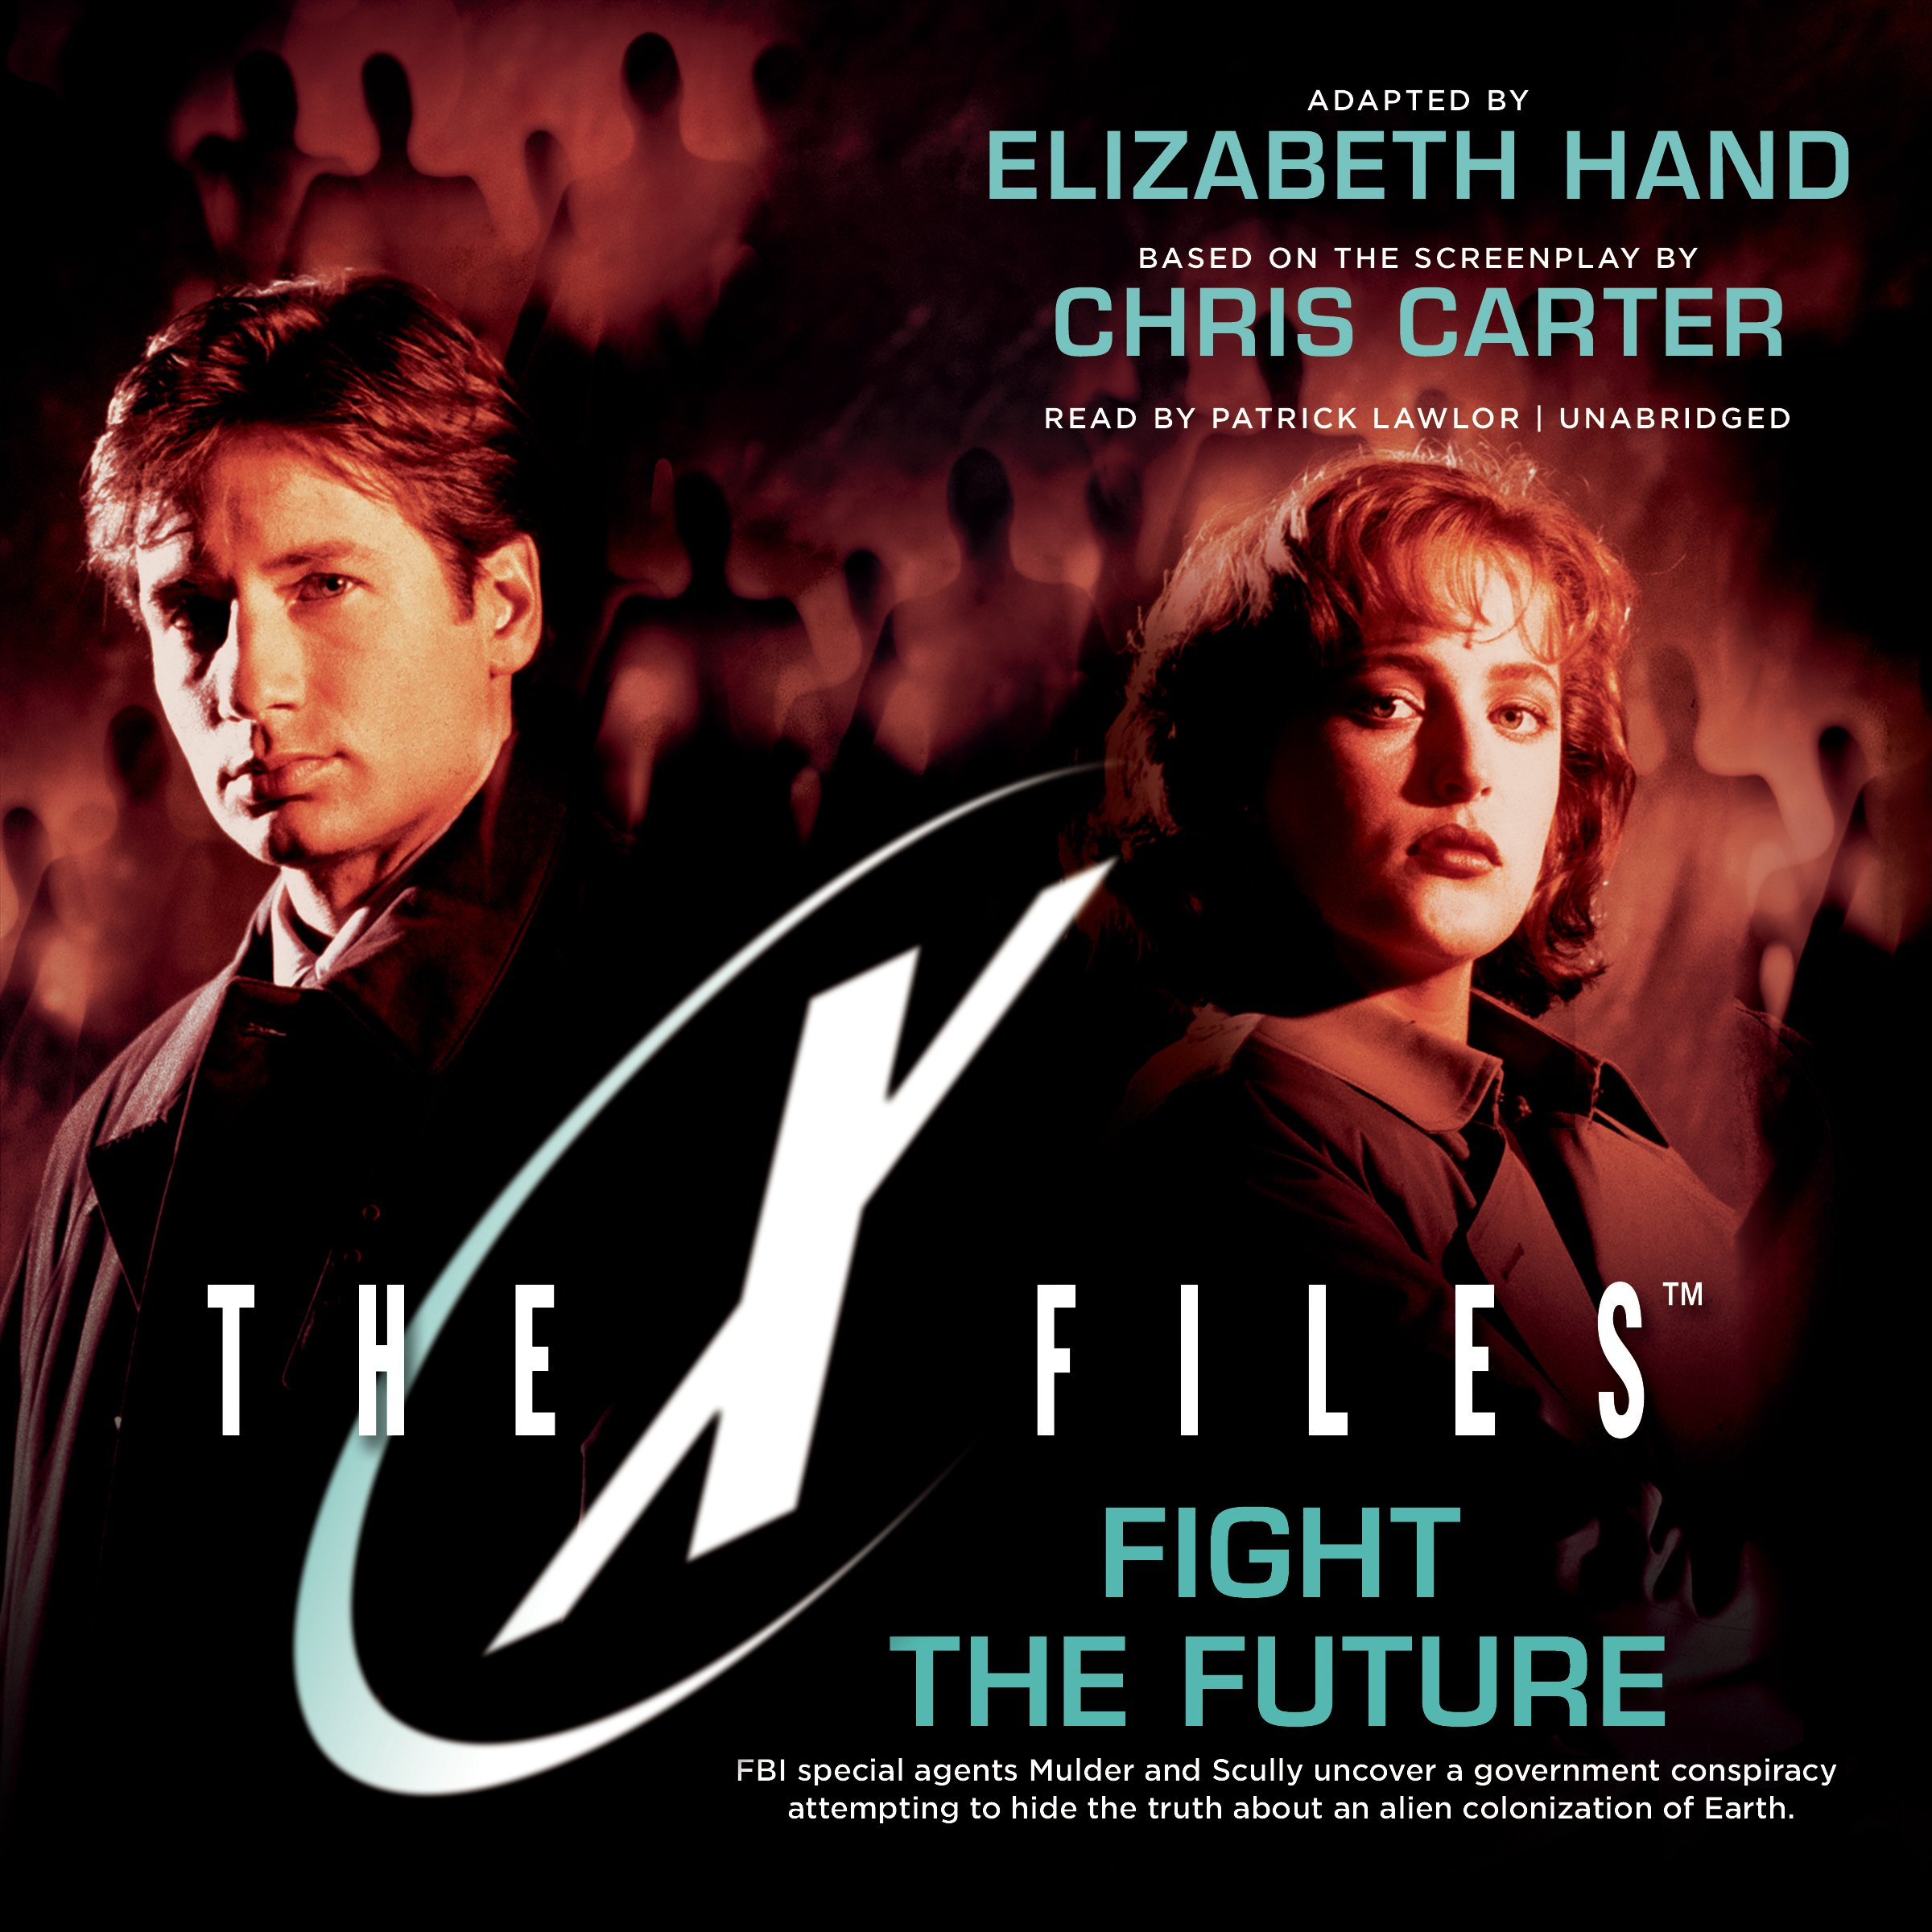 x files movie 1998 online free